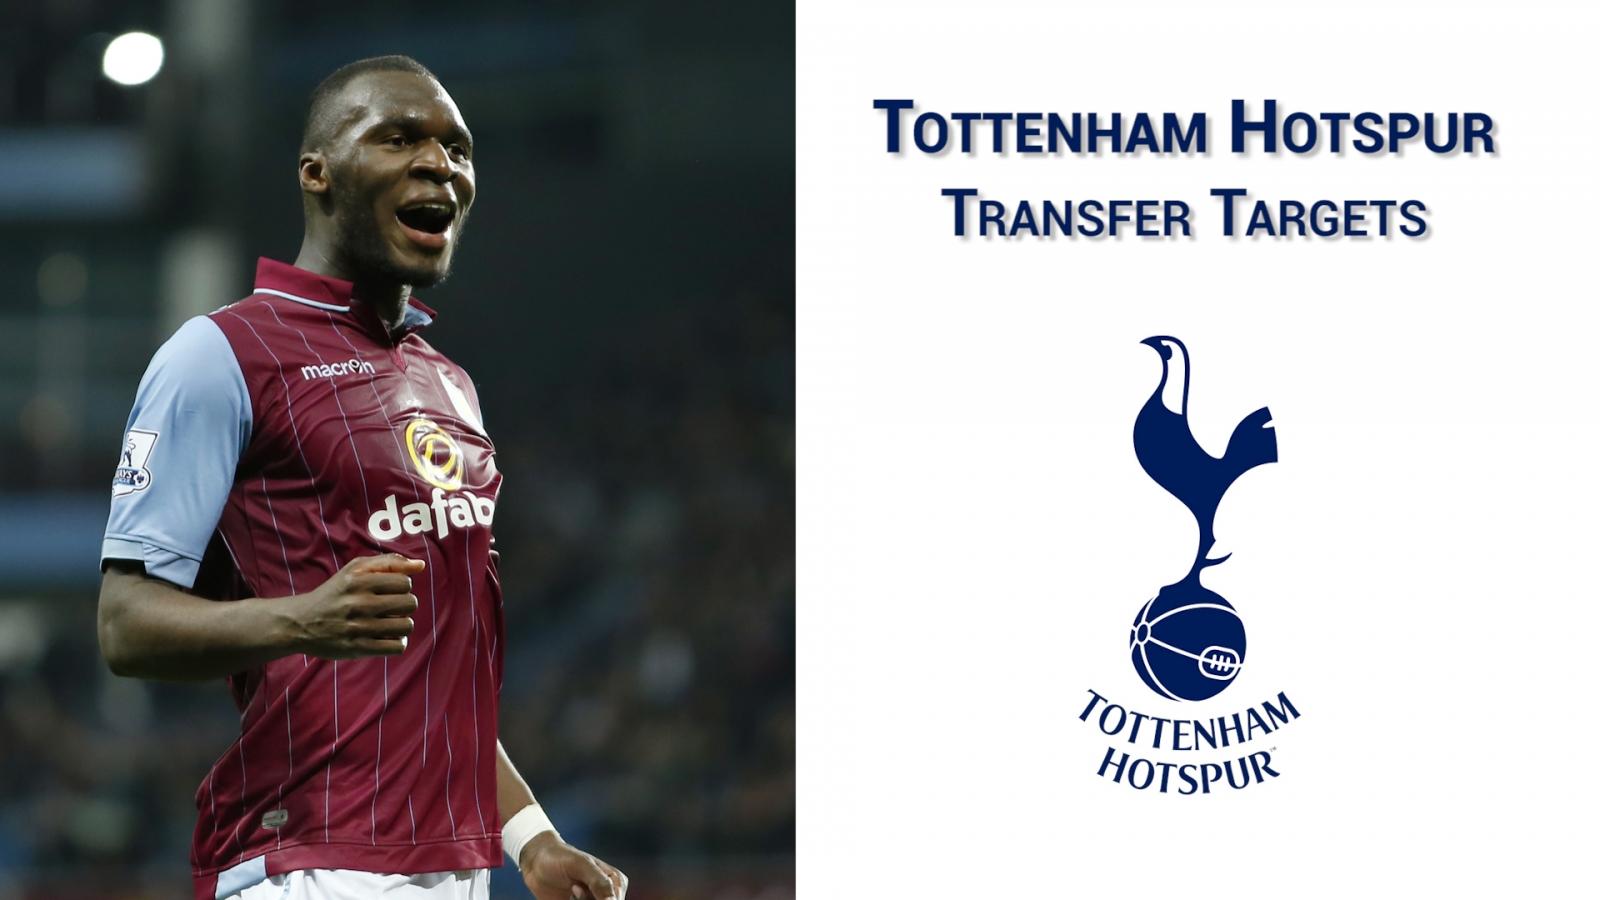 totenham transfer